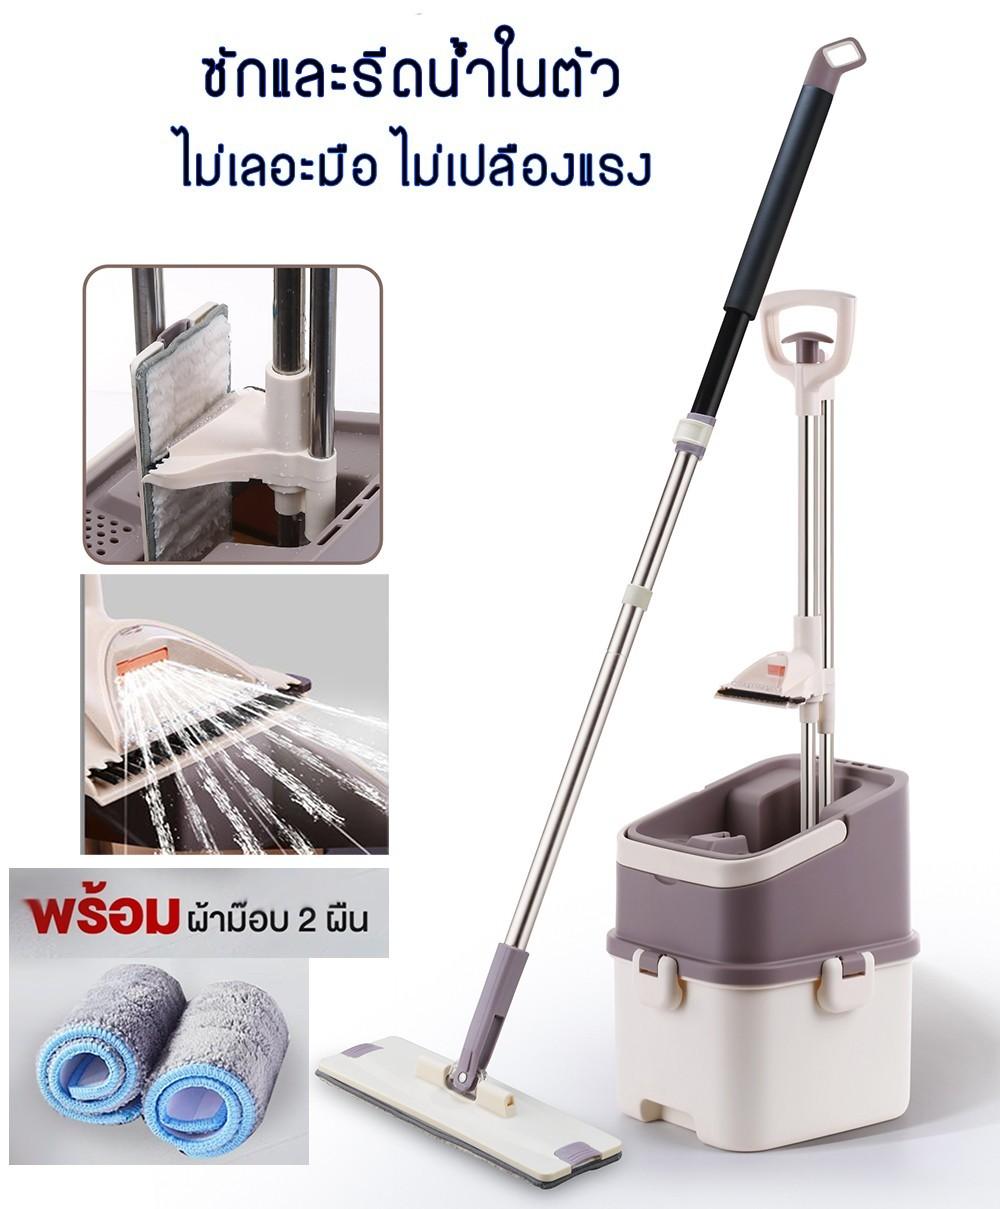 Home Surely ไม้ถูพื้น ชุดถังและไม้ม็อบ 2 in 1 ล้าง ซัก (WASH) และรีดน้ำ (DRY) ในถังเดียว ไม่เลอะมือ Flat Mop อัตโนมัติ